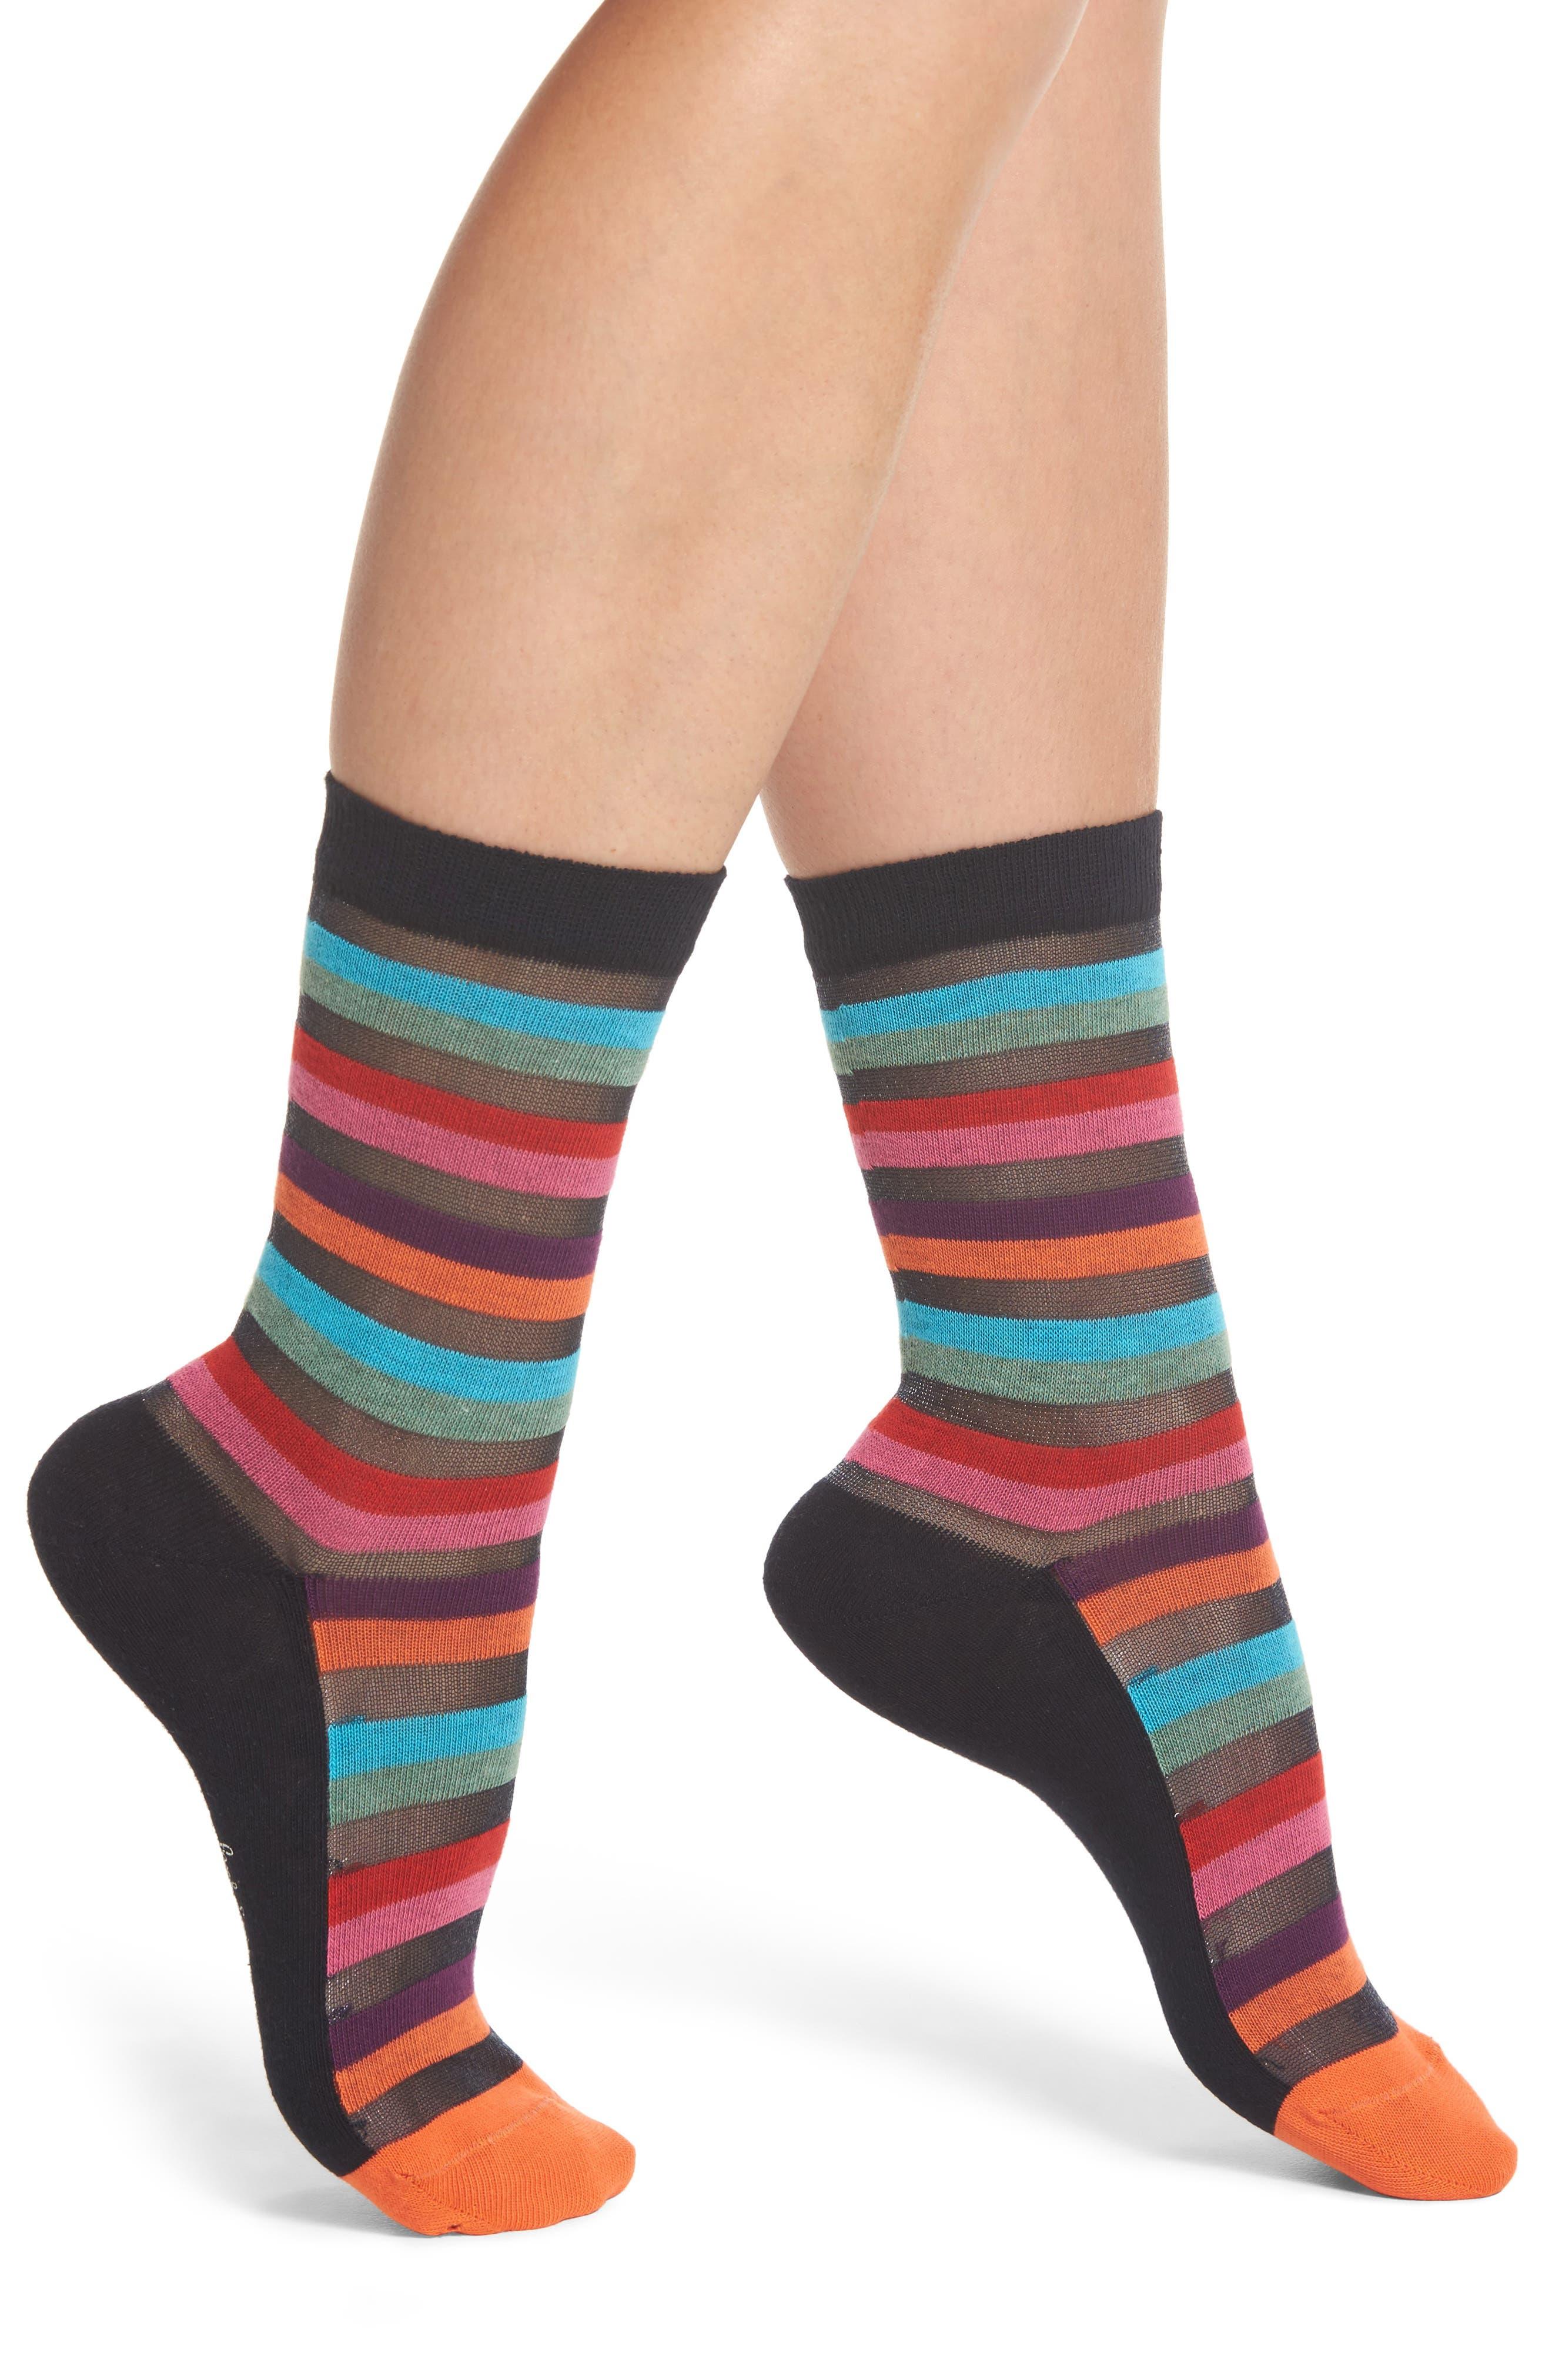 Felicity Rainbow Socks,                         Main,                         color, Black Multi